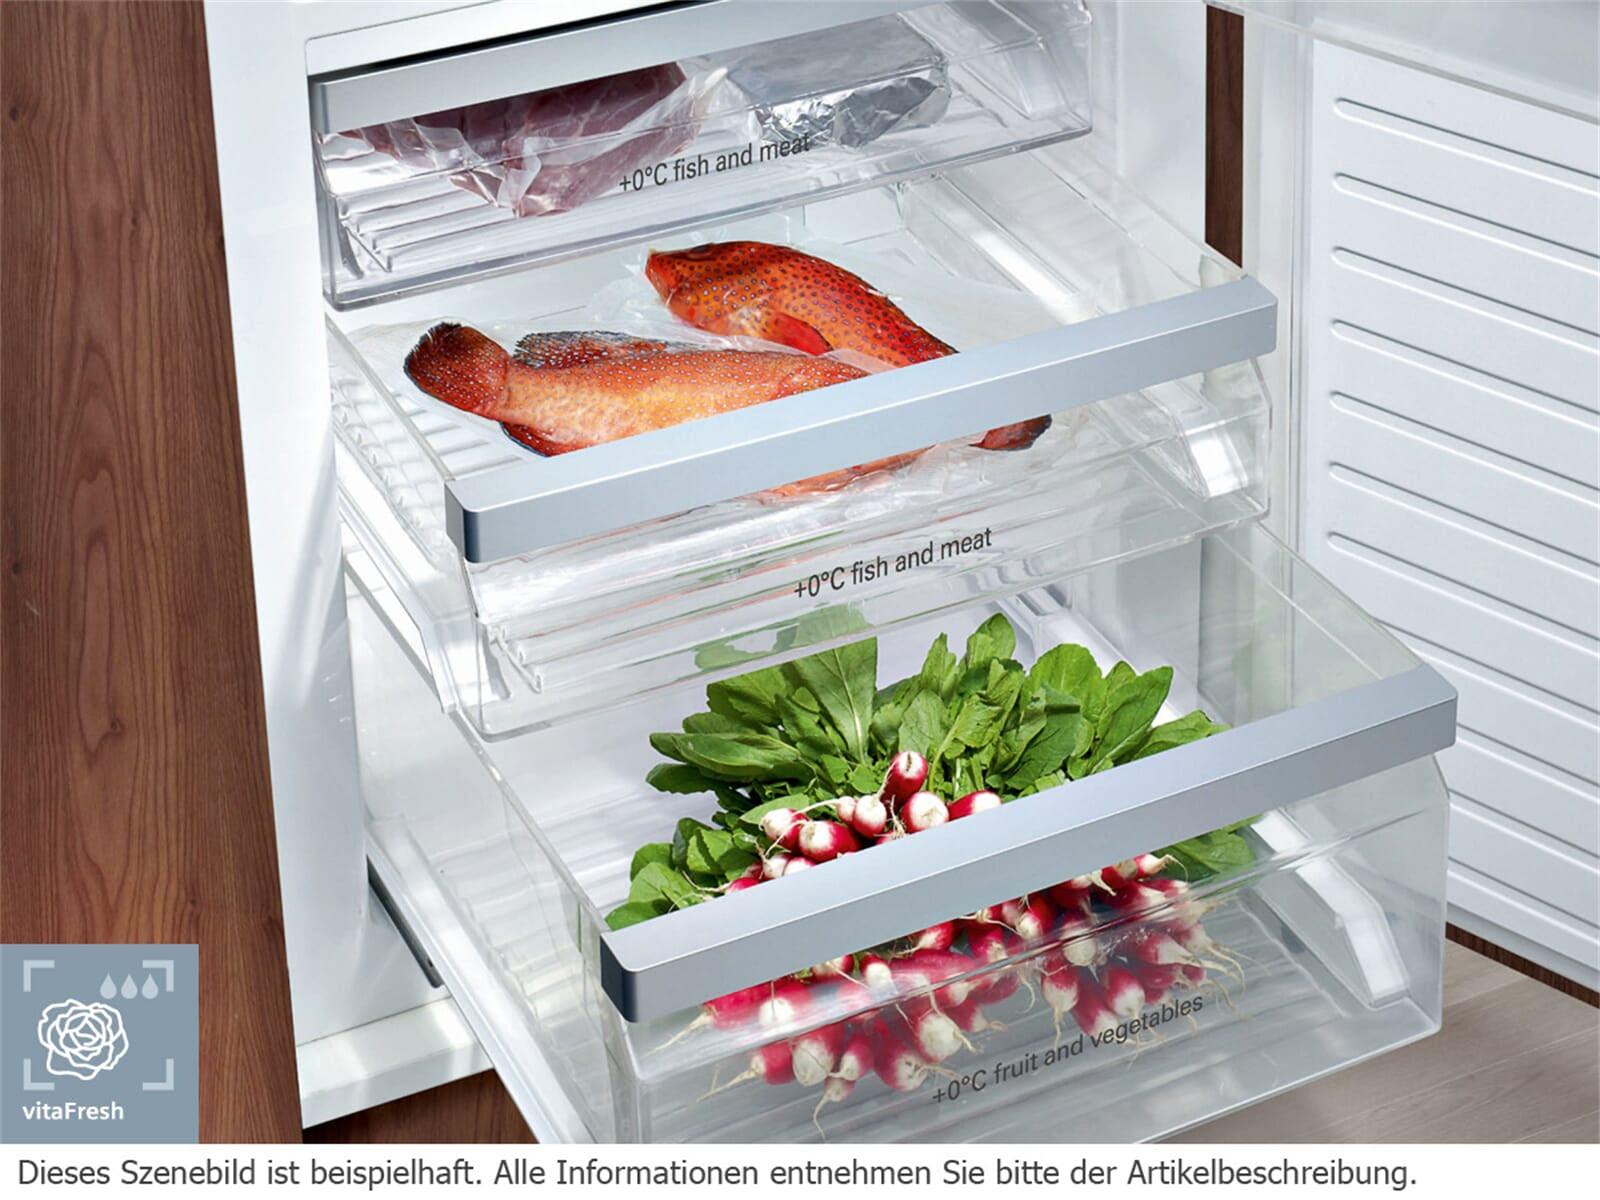 Siemens Kühlschrank Vitafresh : Siemens kühlschrank vitafresh bedienungsanleitung siemens kg ebay